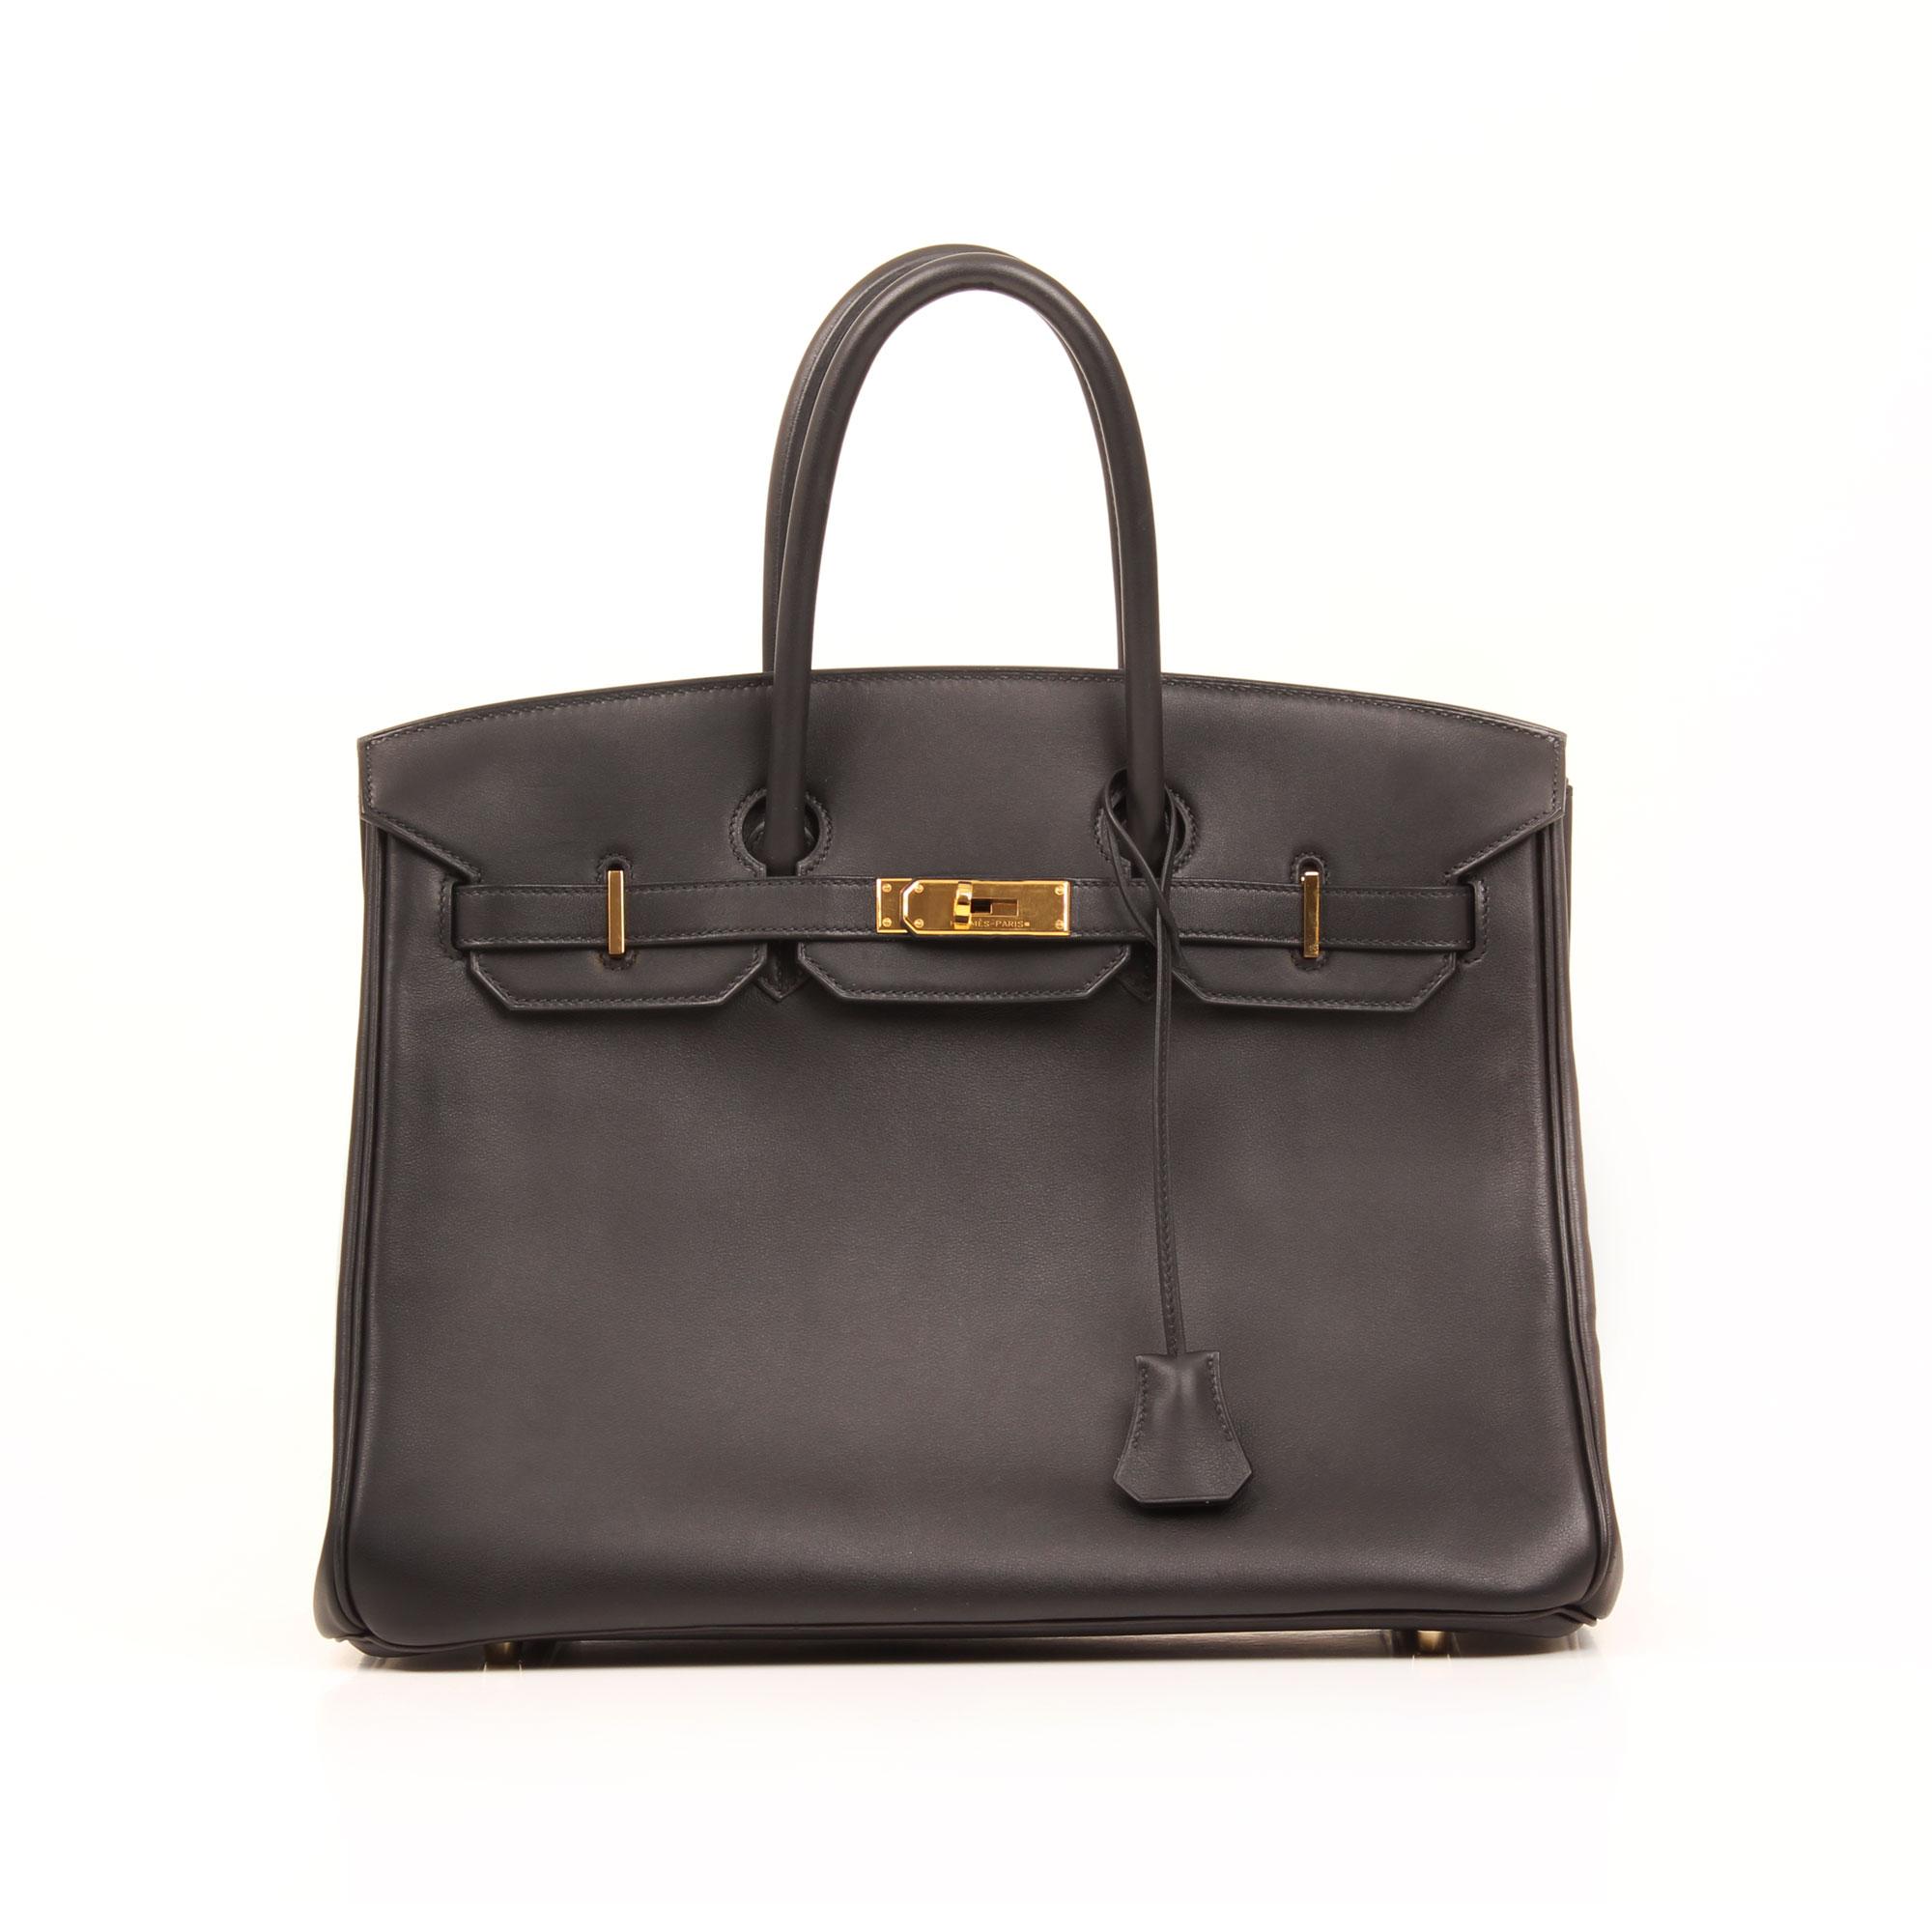 bag-hermes-birkin-35-chamonix-black-front